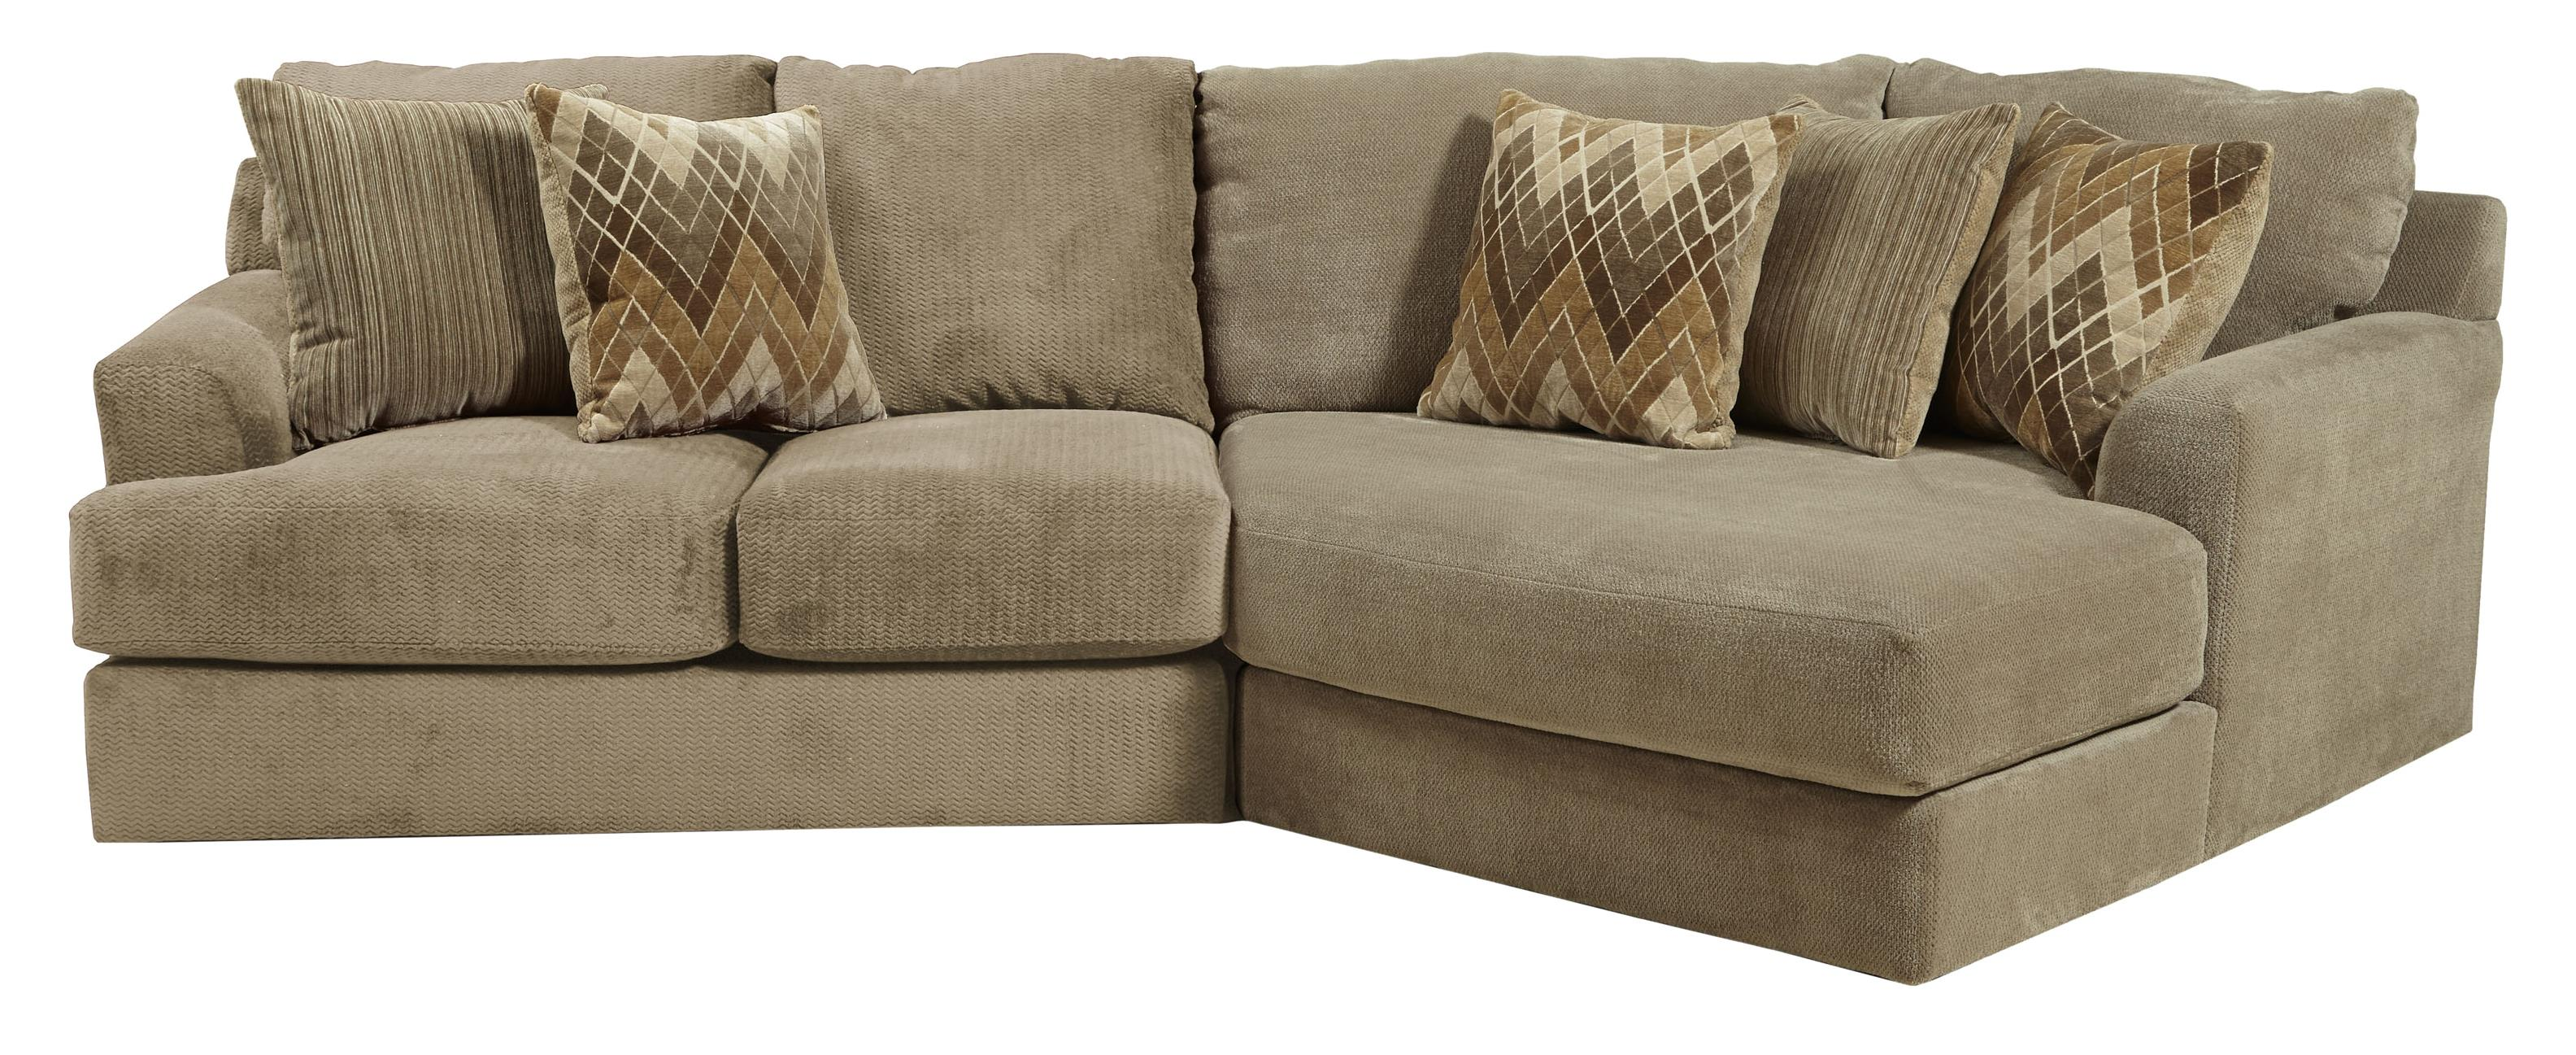 Jackson Furniture Malibu Three Seat Sectional  - Item Number: 3239-46+96--Sand